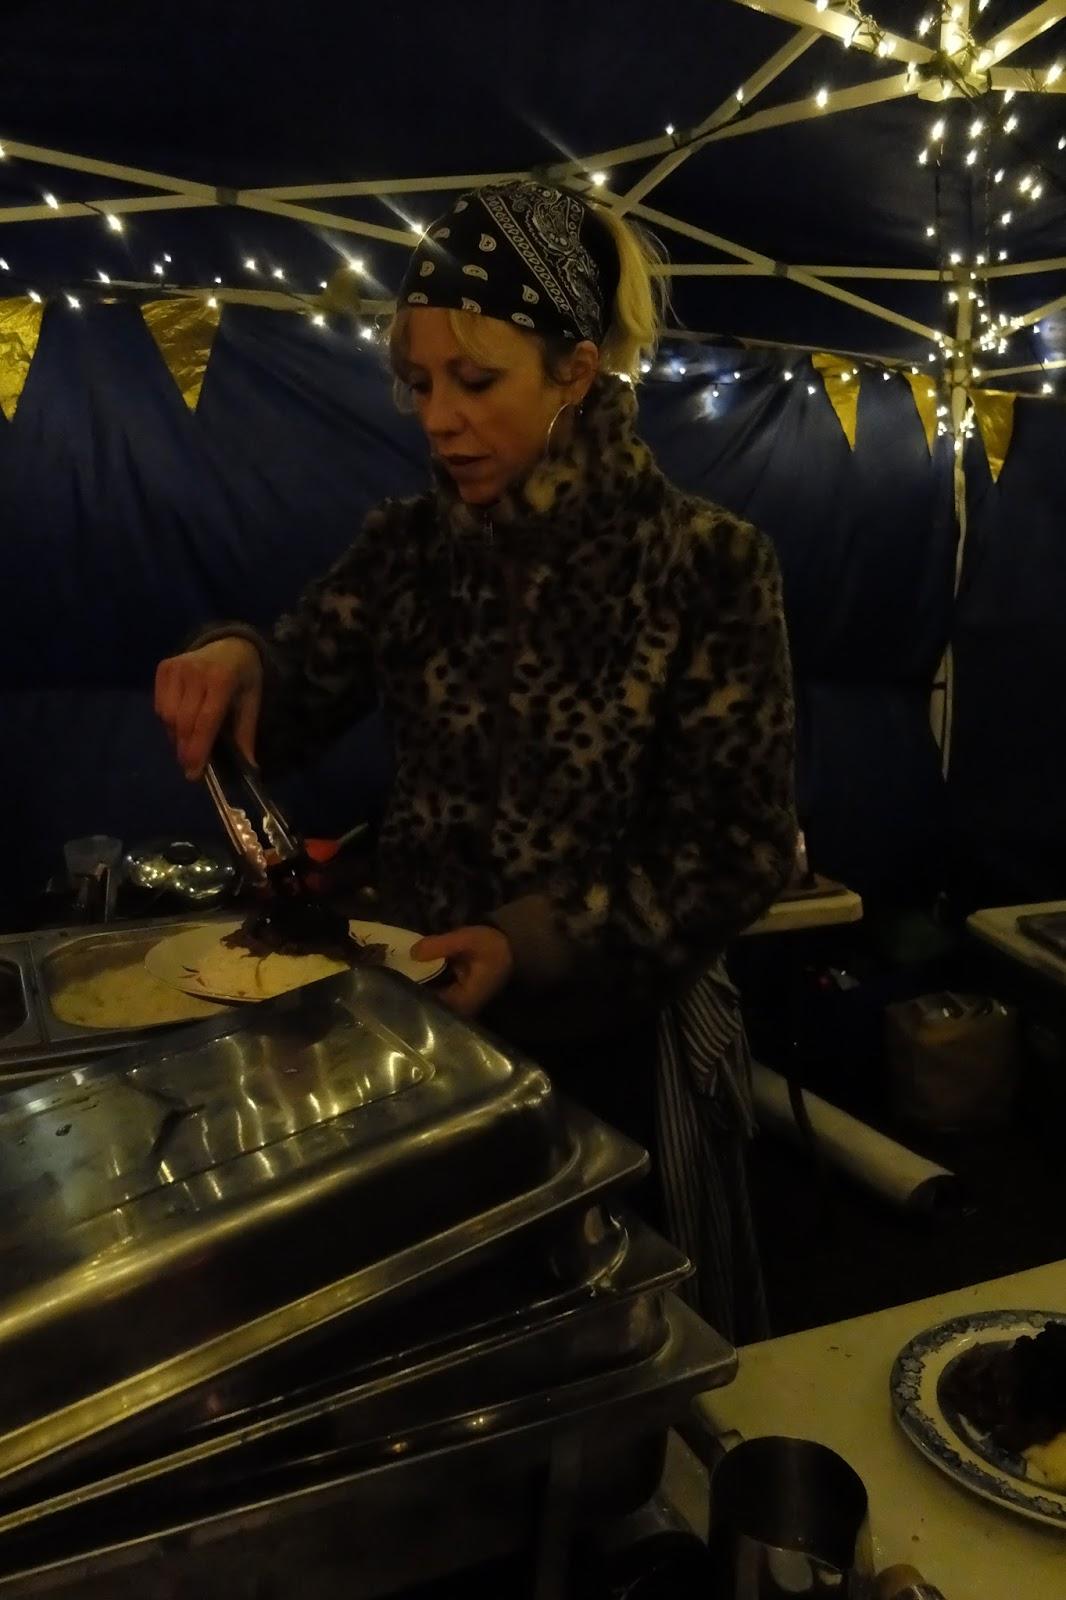 Supper Club at Tilt Cafe Brighton